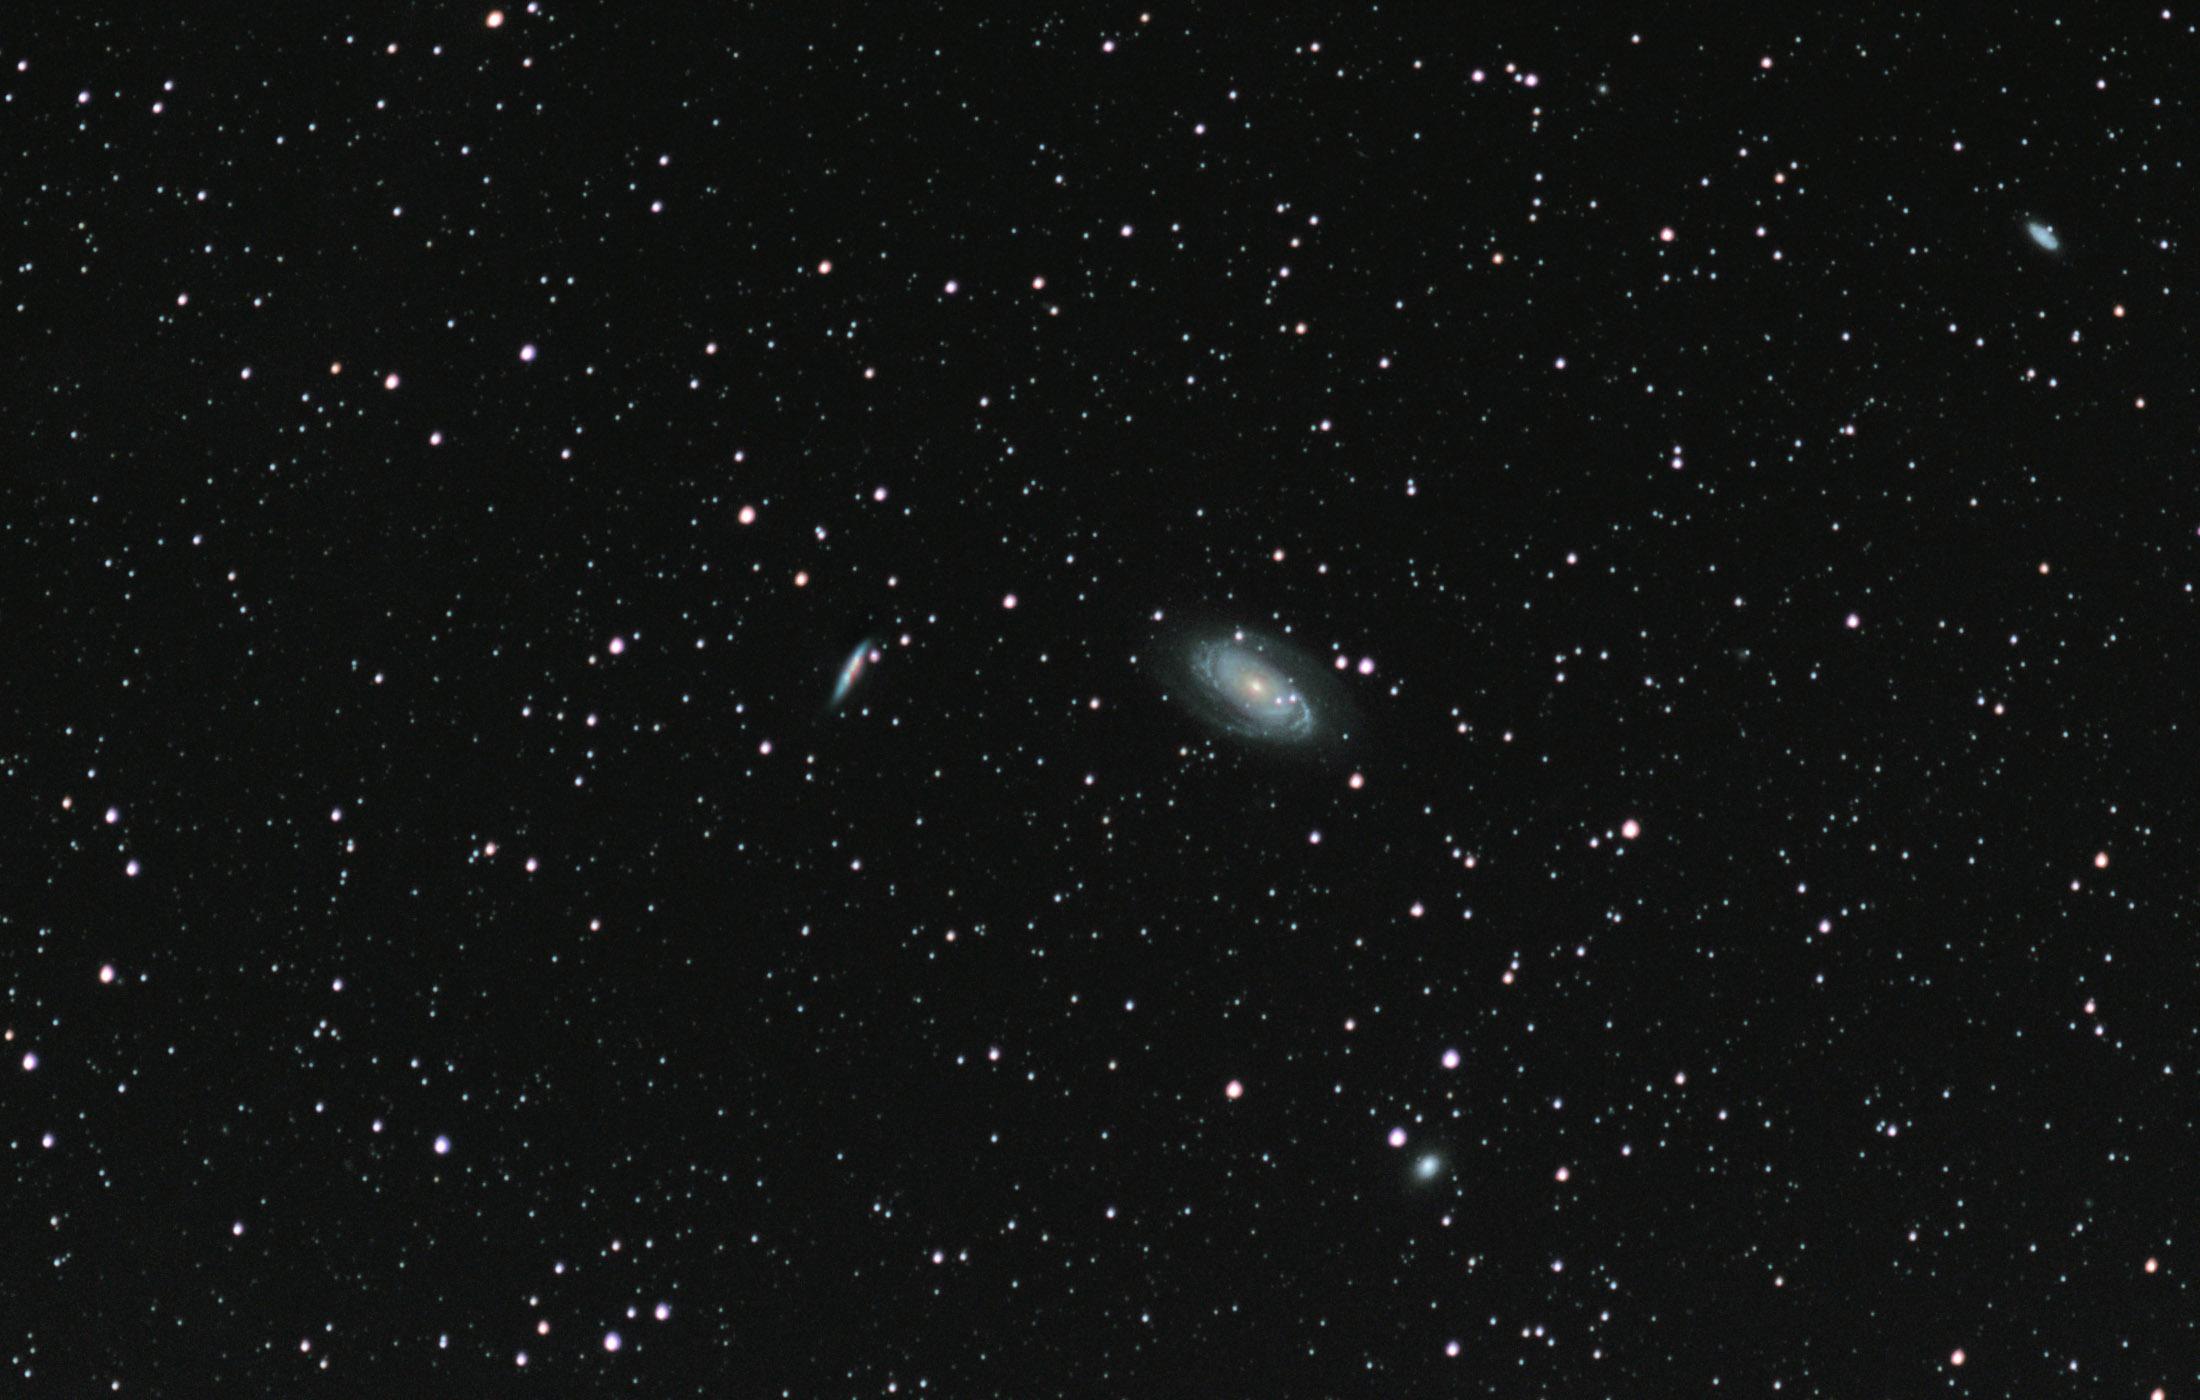 cigar galaxy M81 M82 supernova nikon 180mm